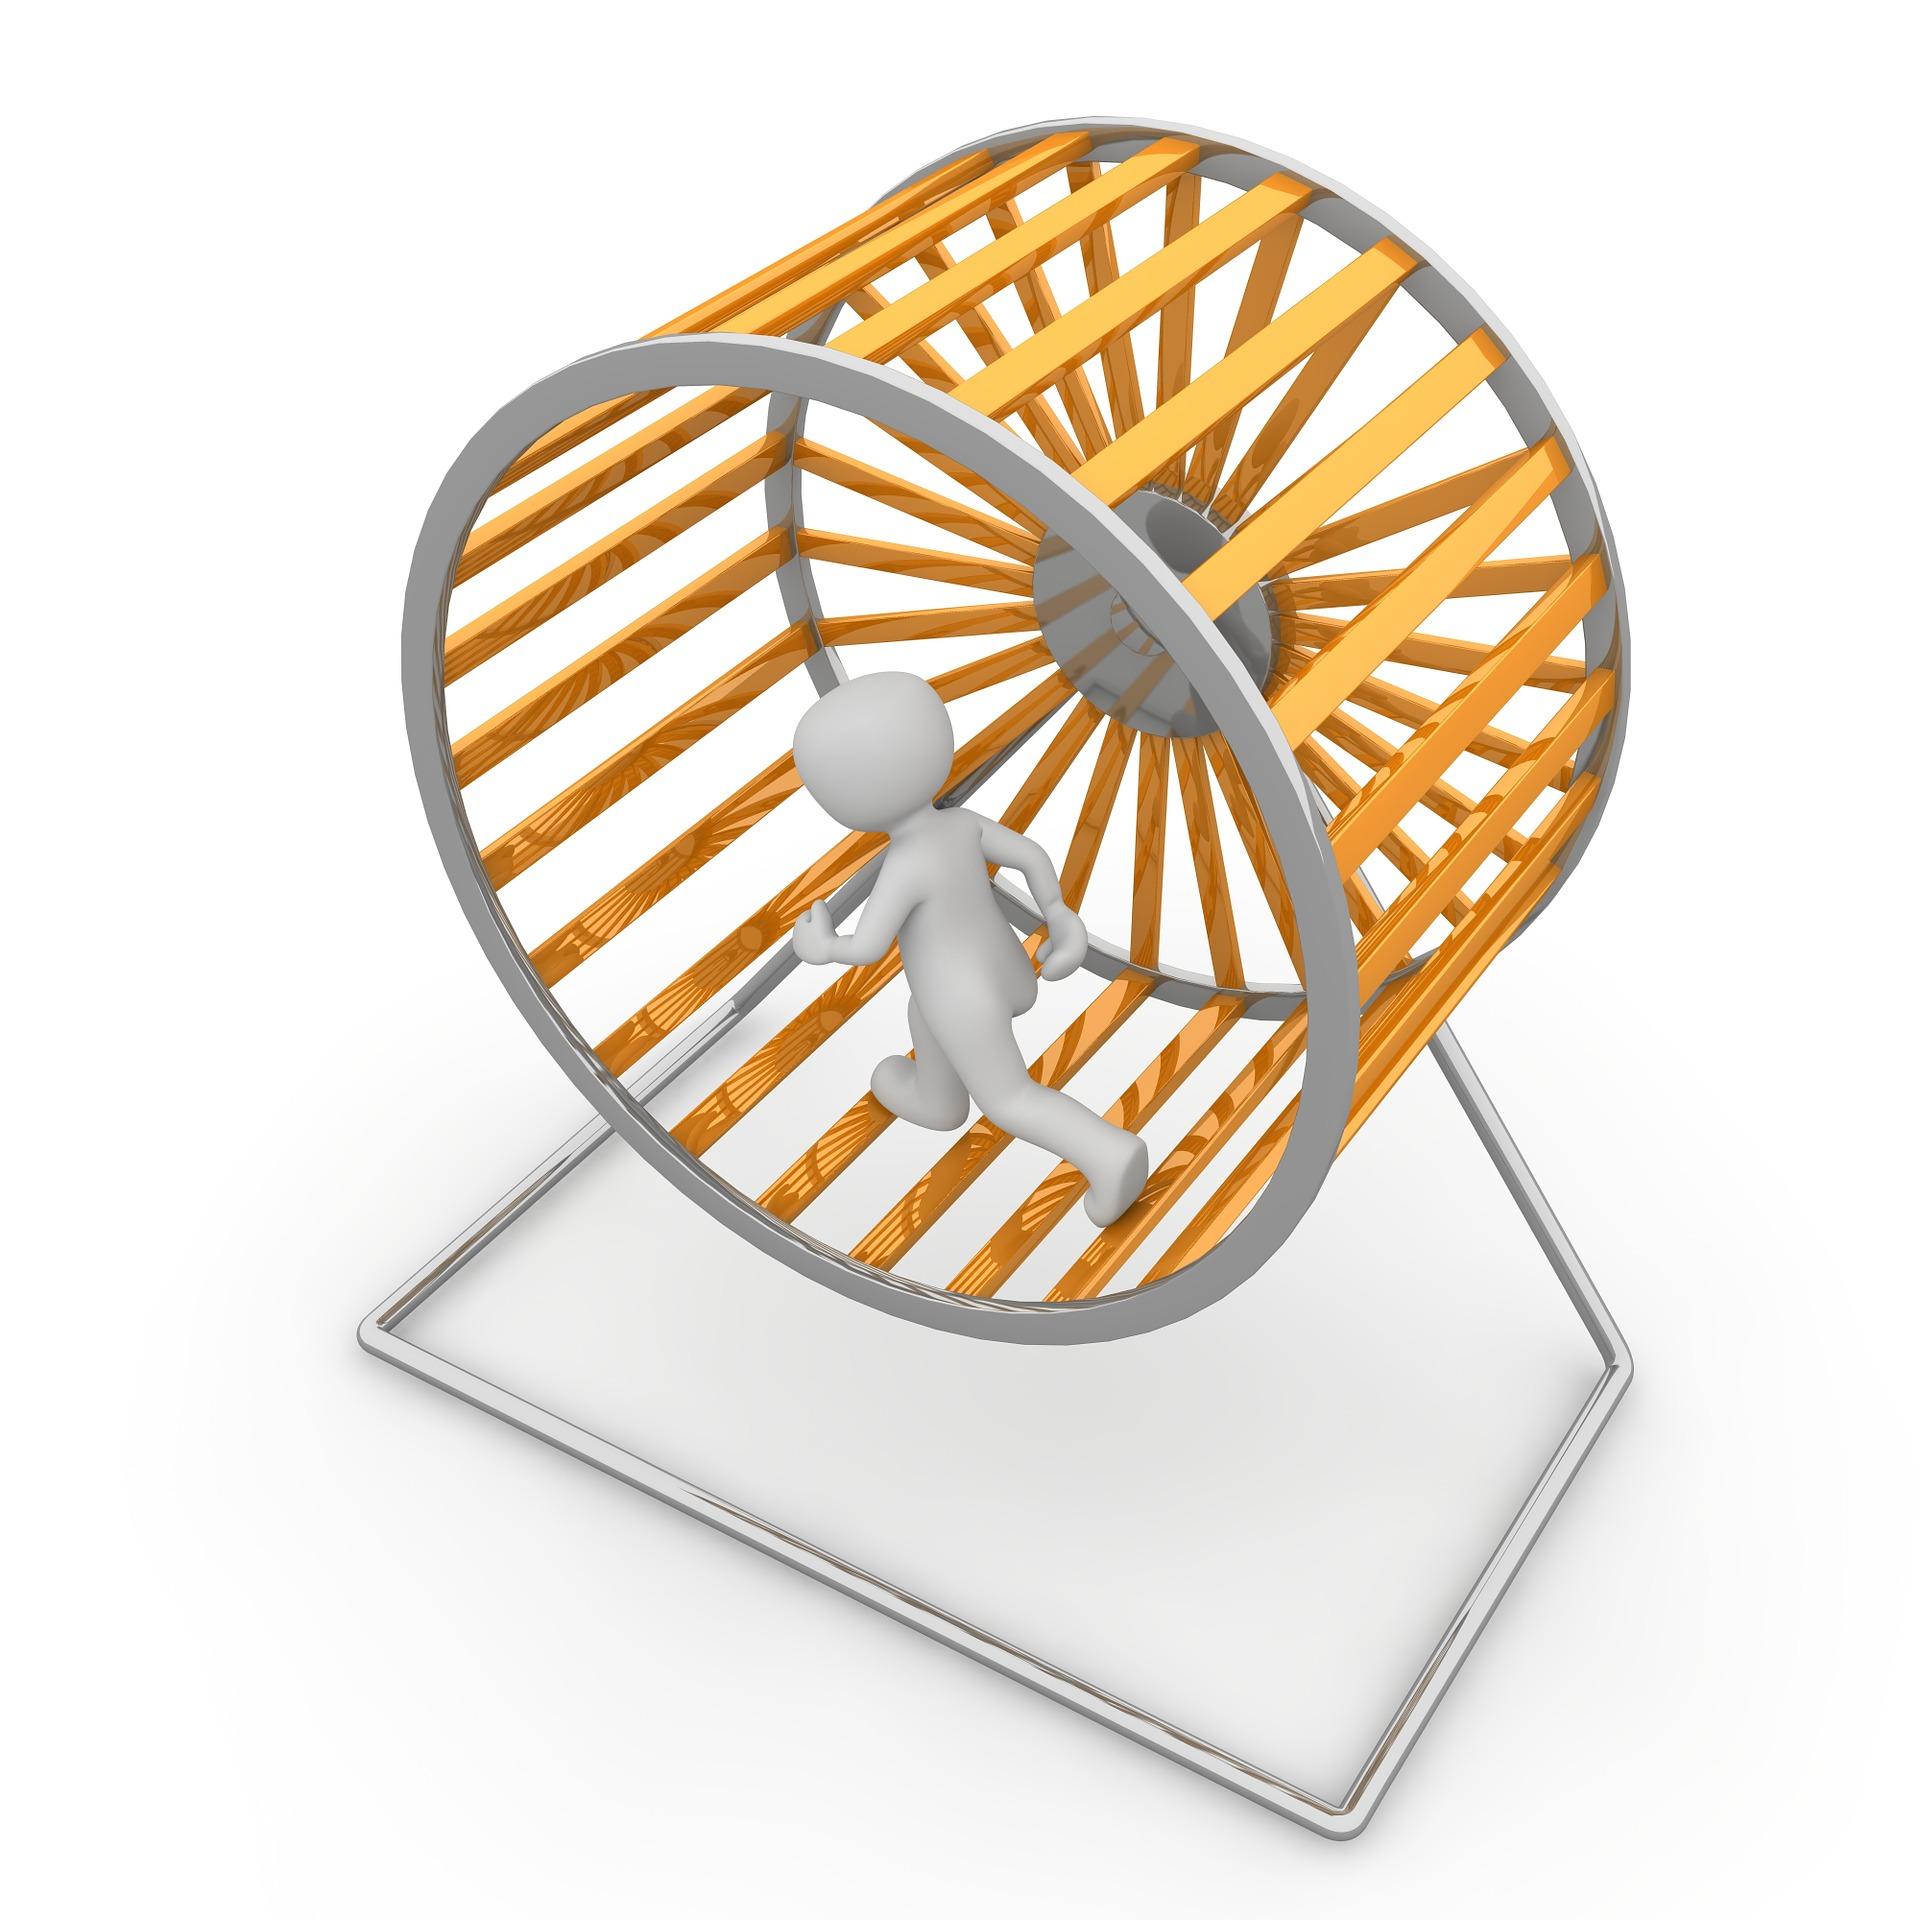 hamster-wheel-1014036_1920